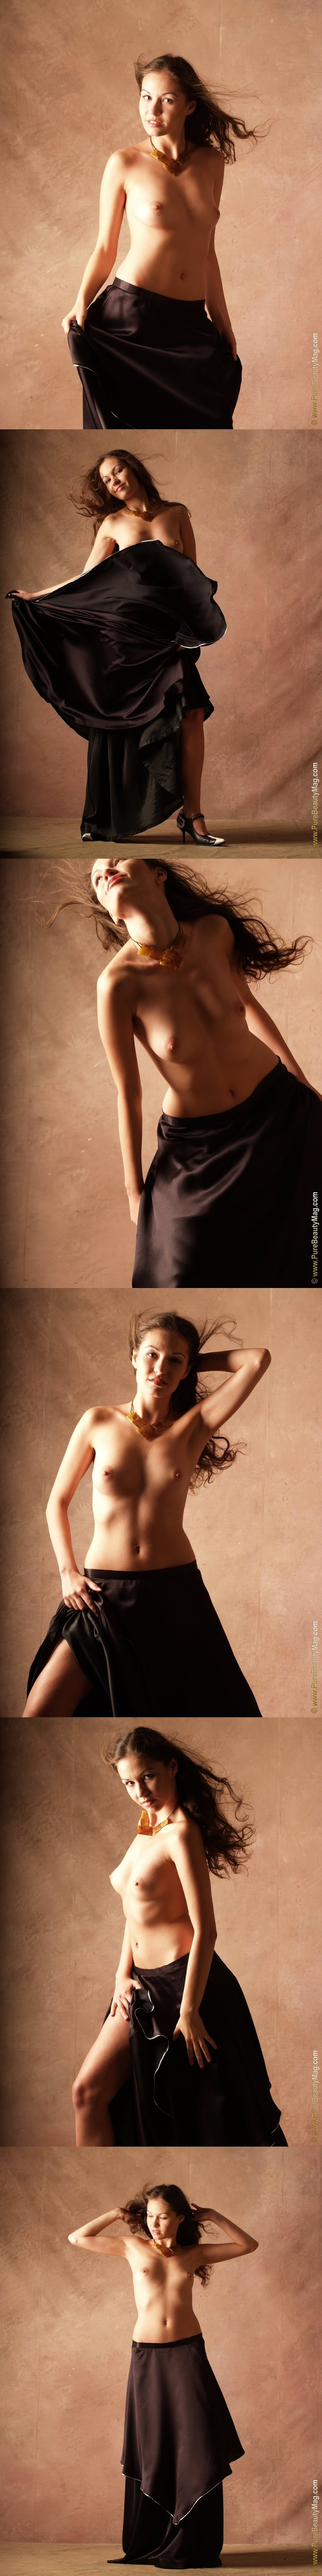 PureBeautyMag PBM  - 2005-08-09 -  s105168 - Erika Nasticka - Evening Elegance - 2560px